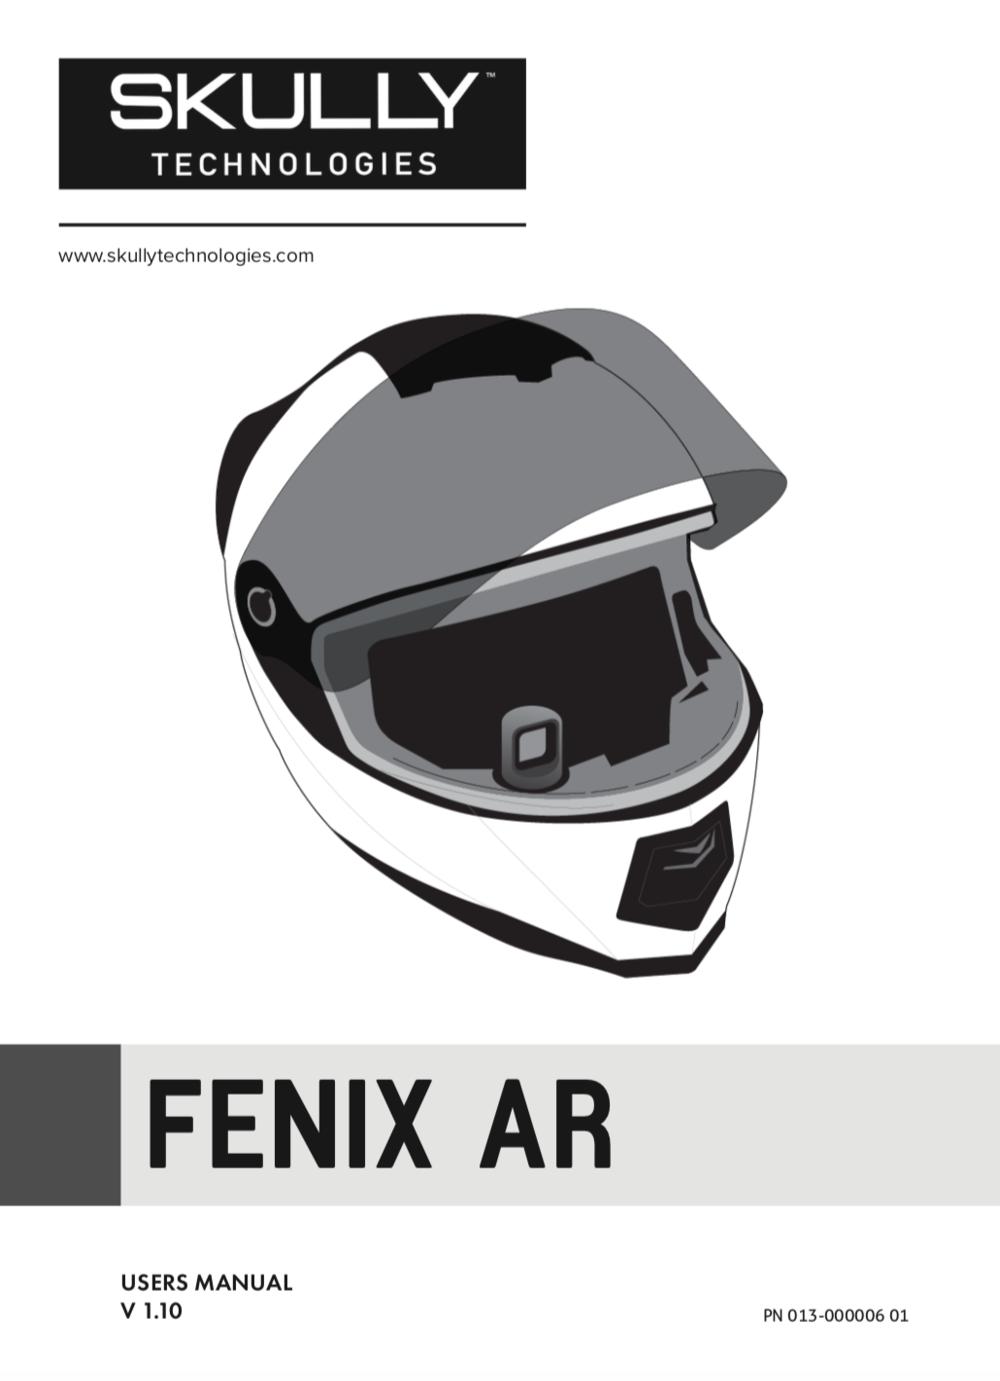 Skully Fenix AR Manual